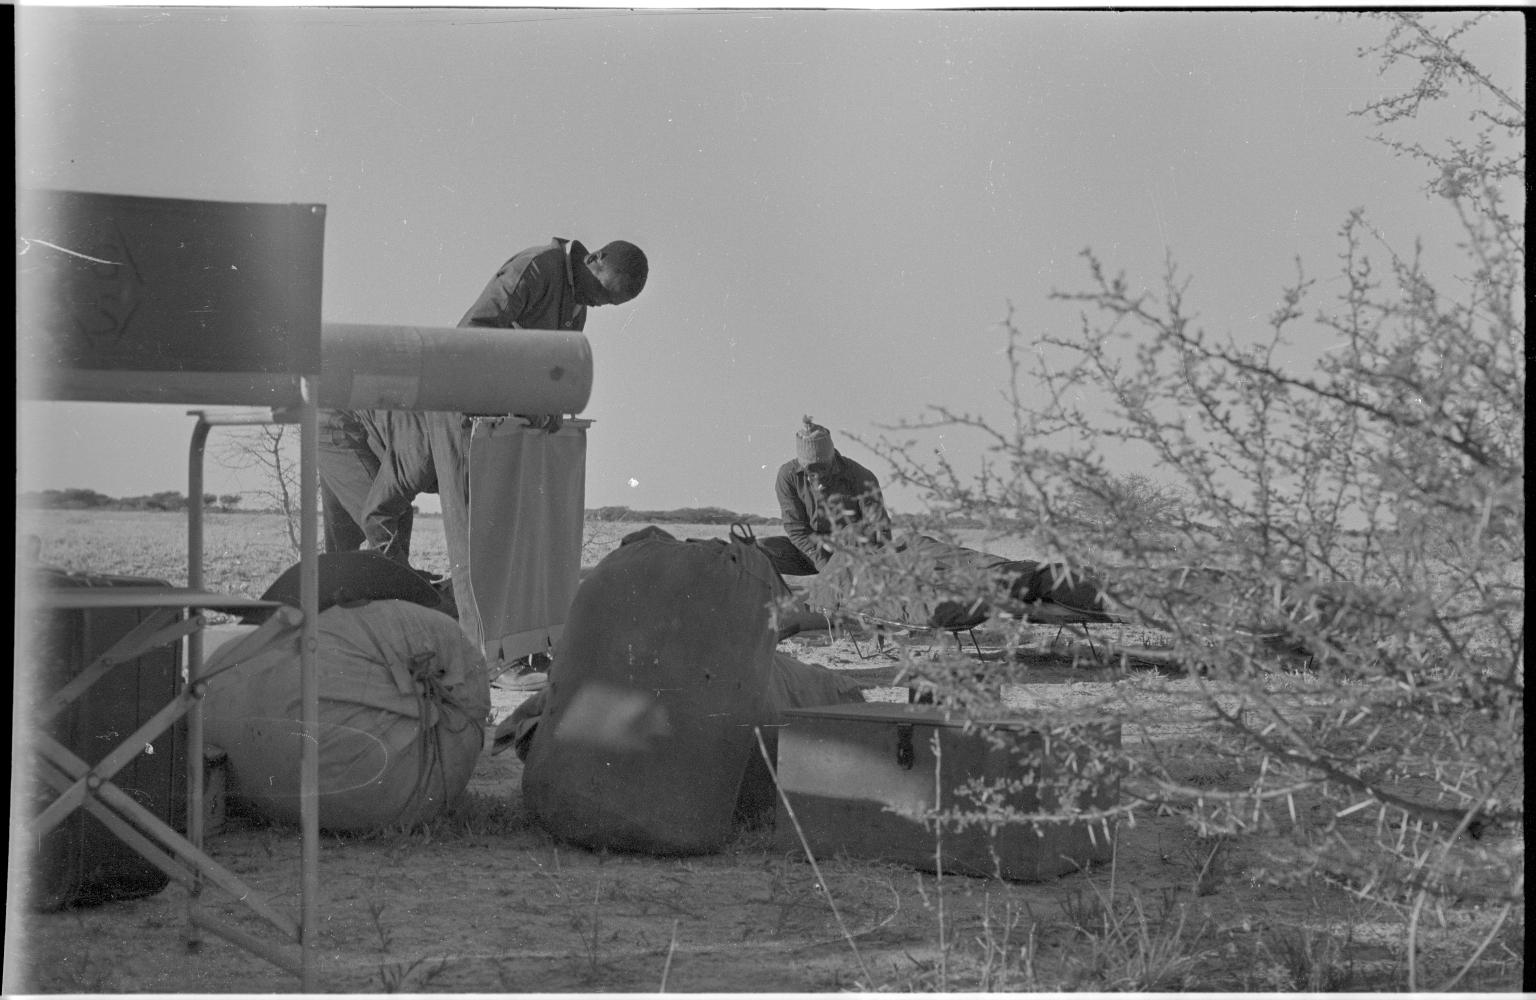 Camp site in Botswana